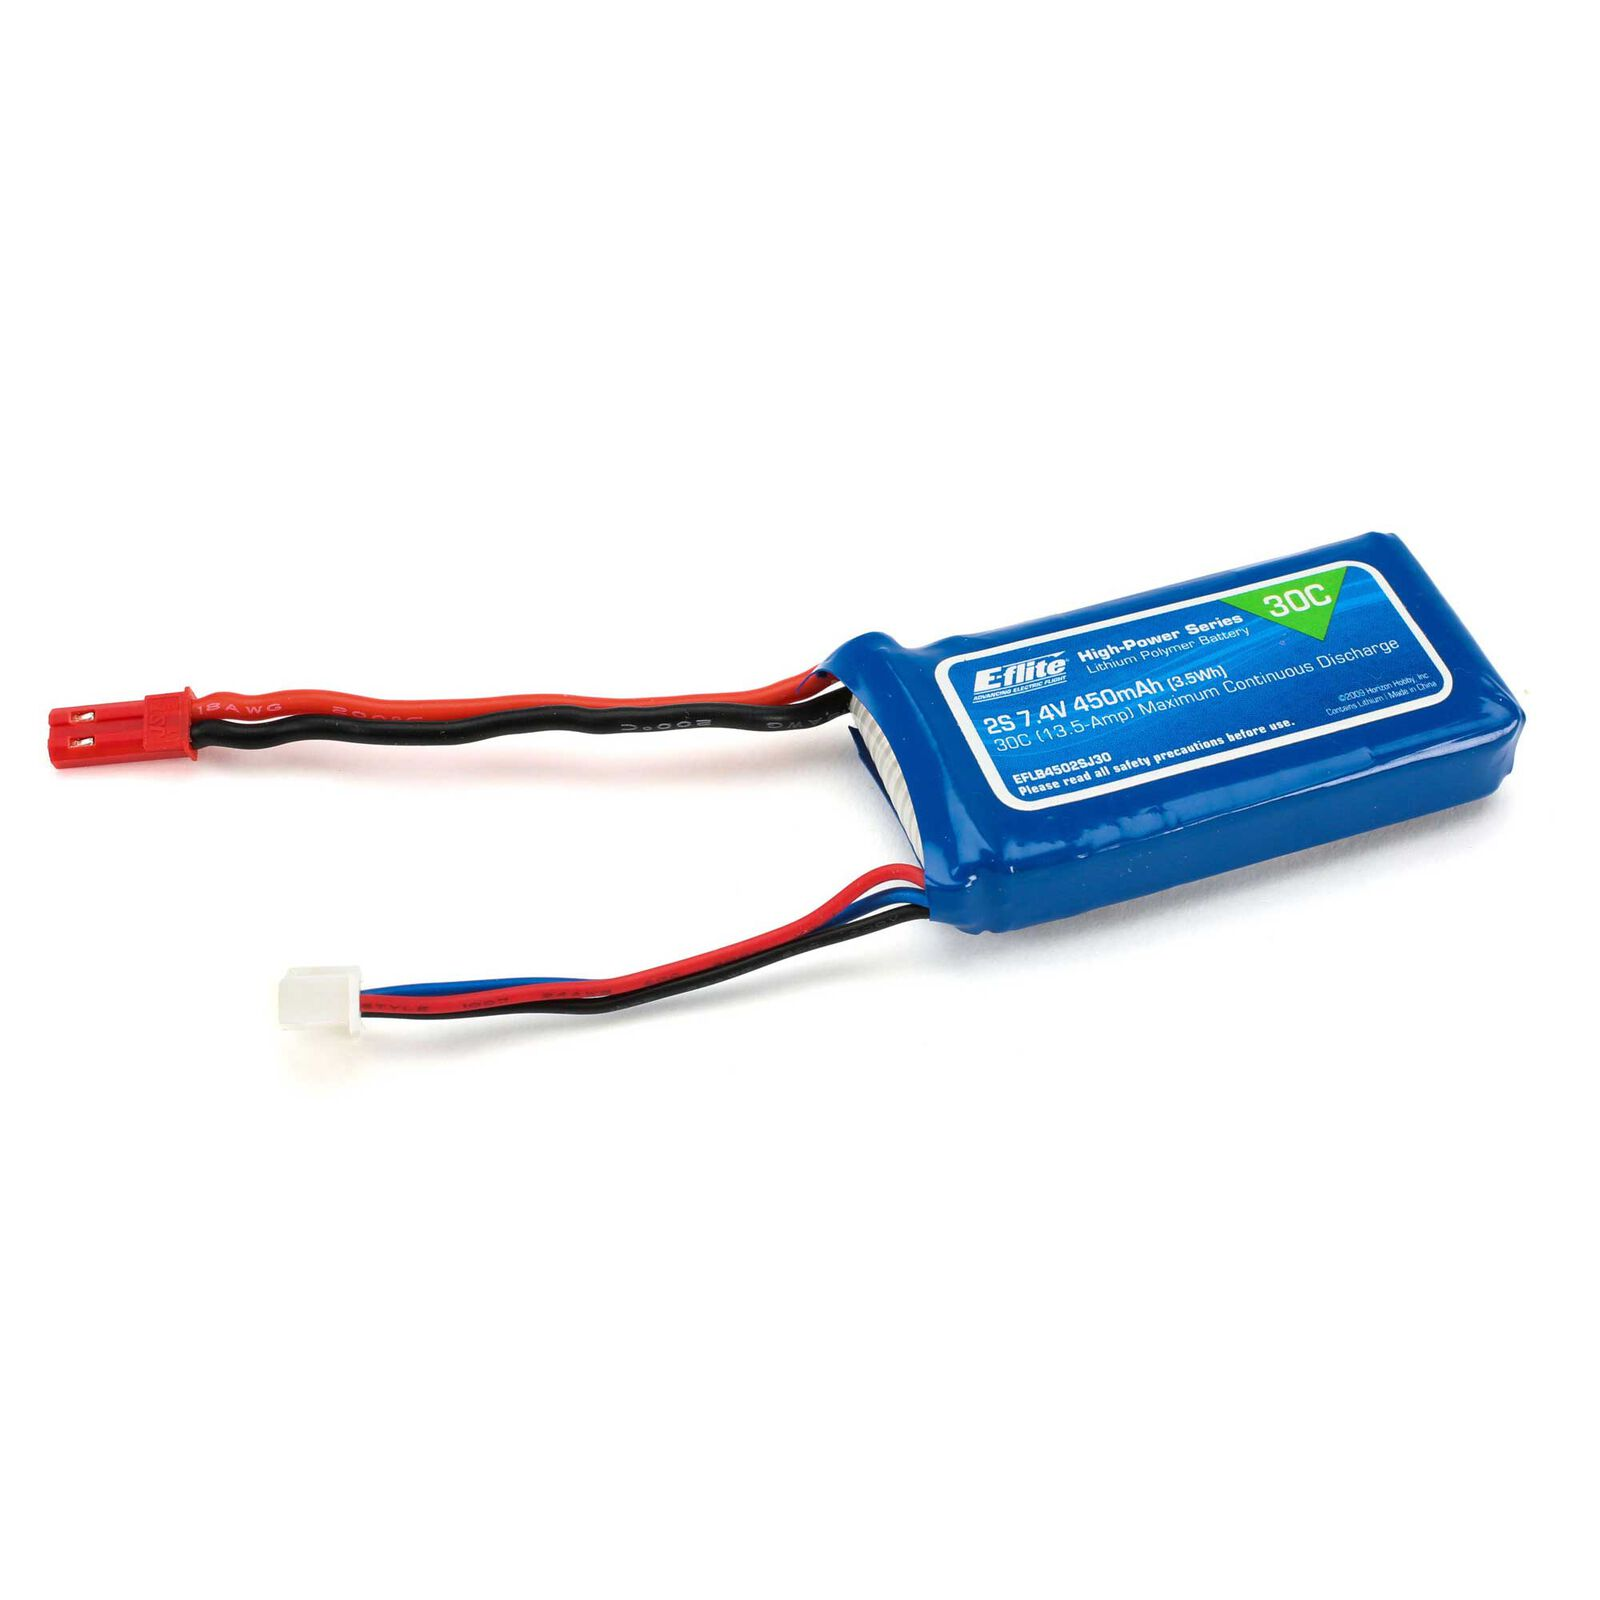 7.4V 450mAh 2S 30C LiPo Battery: JST